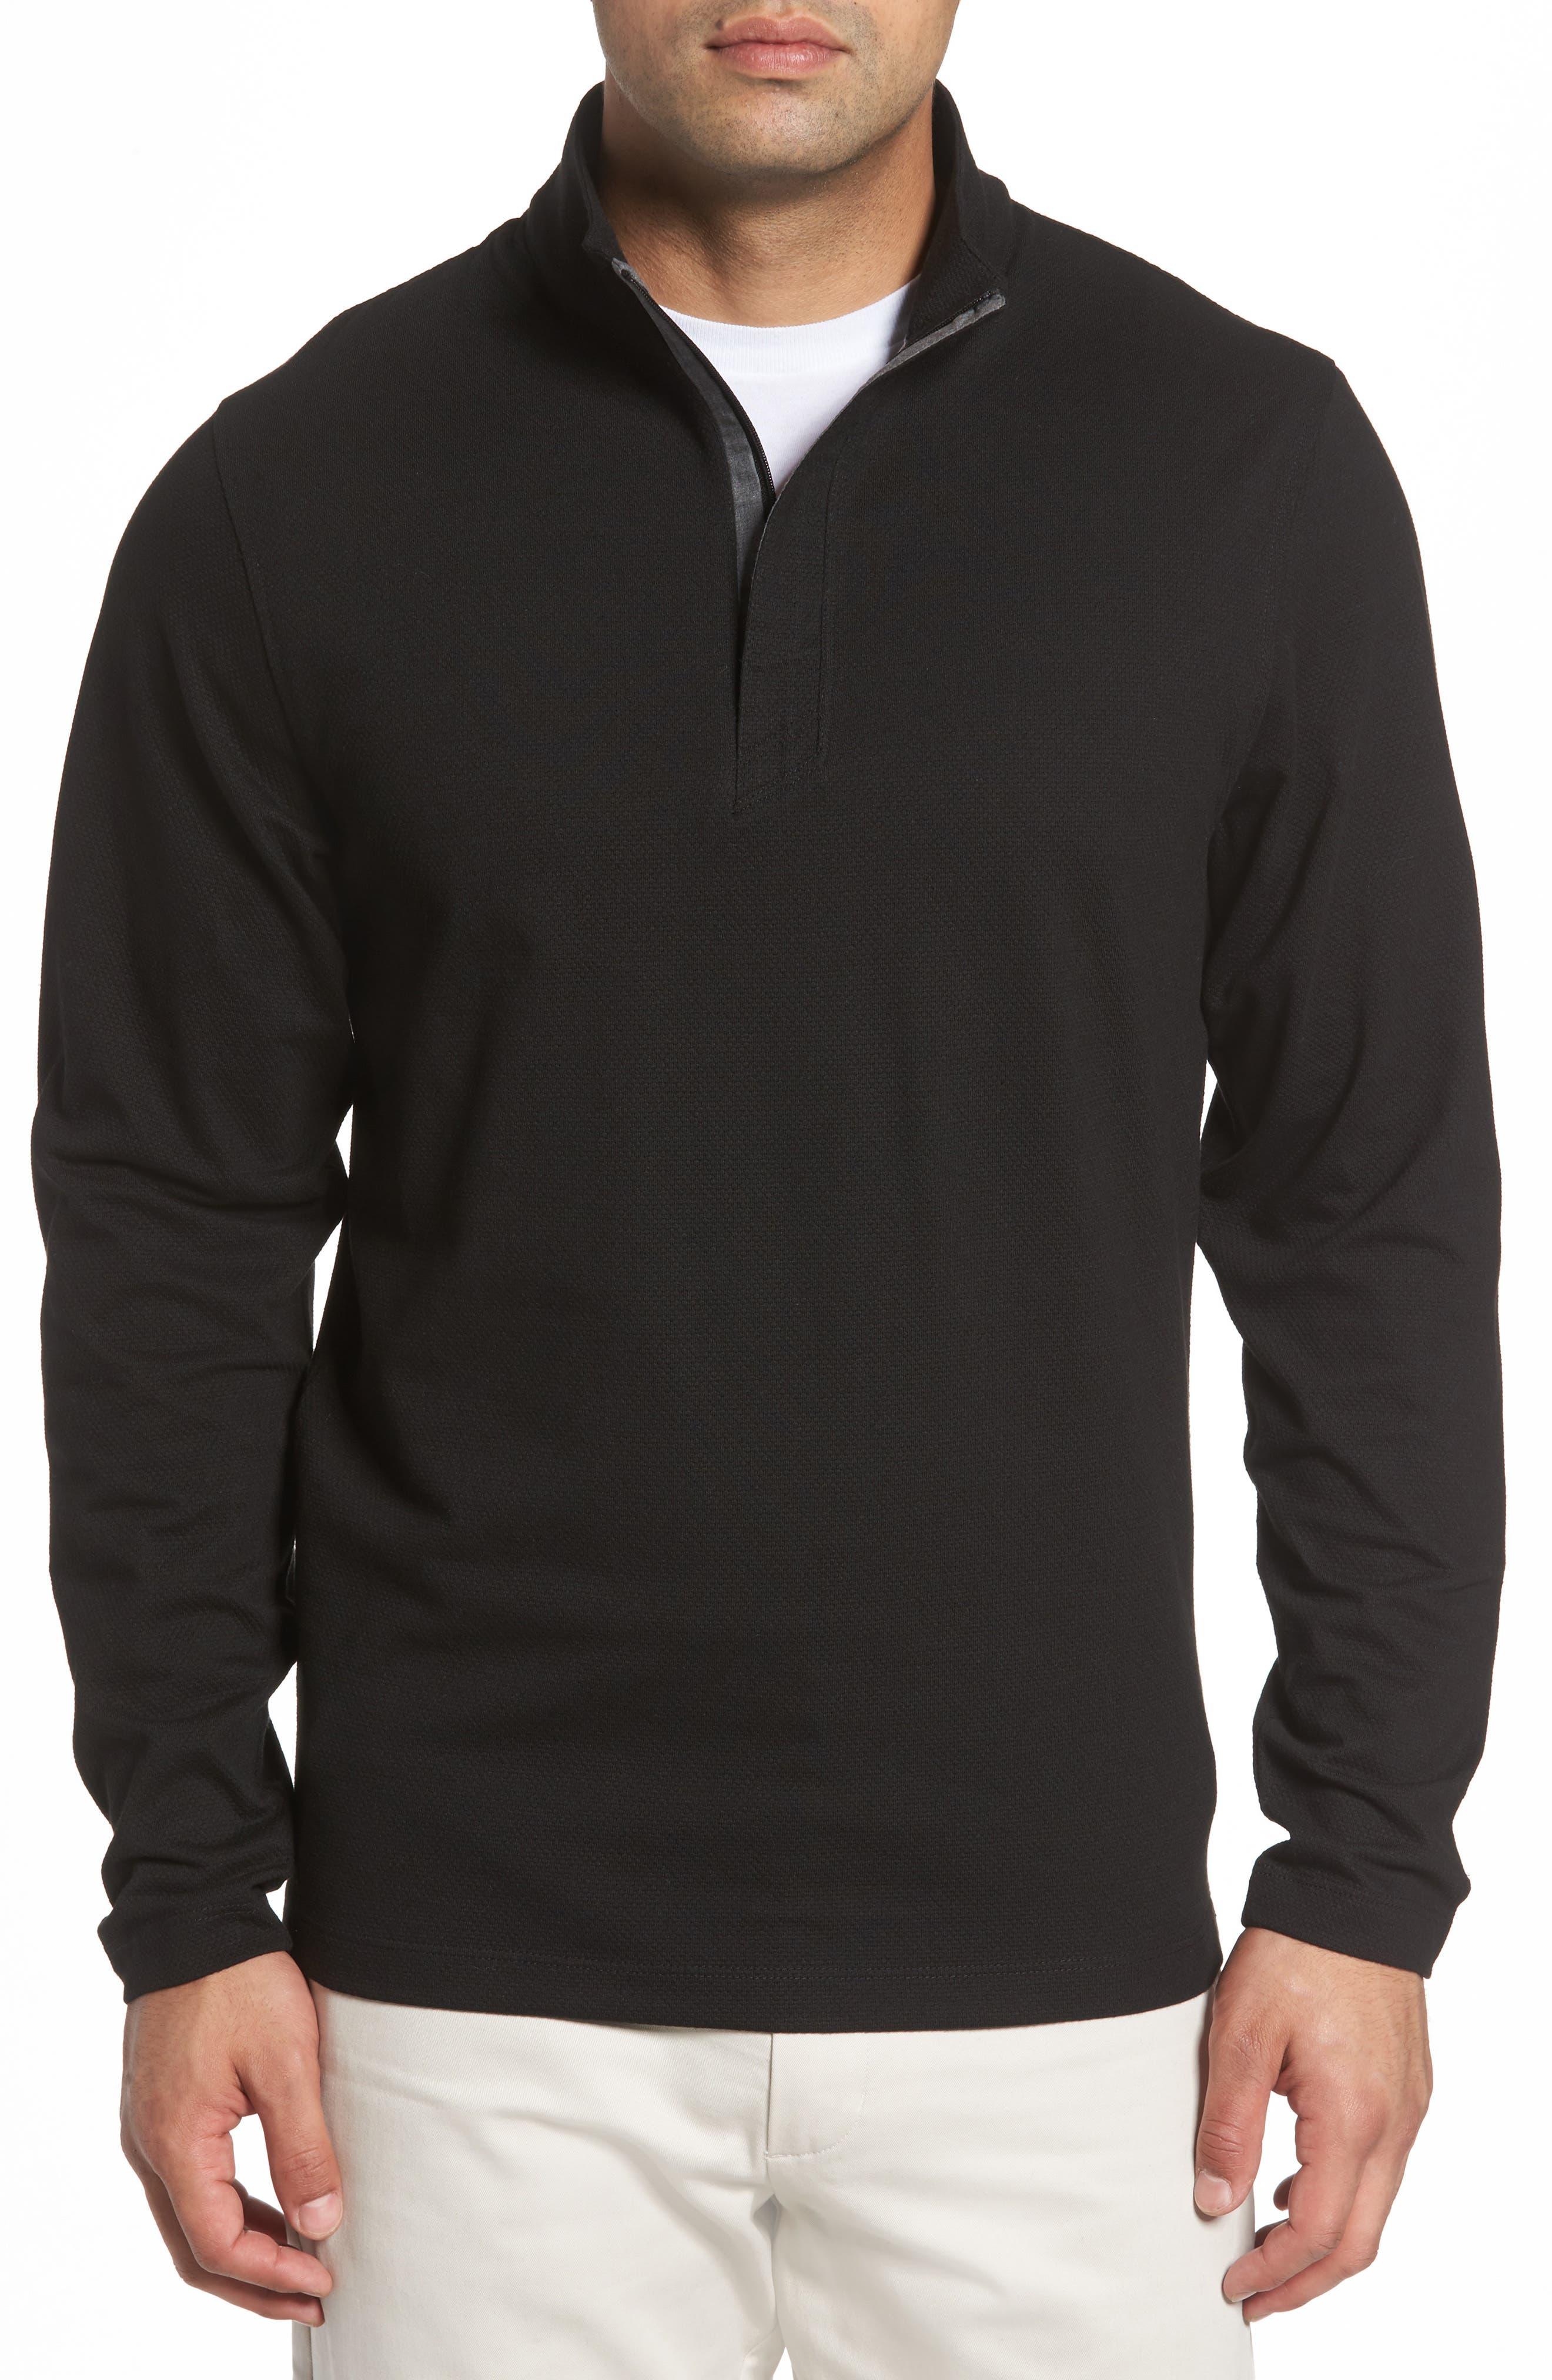 Hewitt Quarter-Zip Waffle Knit Pullover,                             Main thumbnail 1, color,                             Black